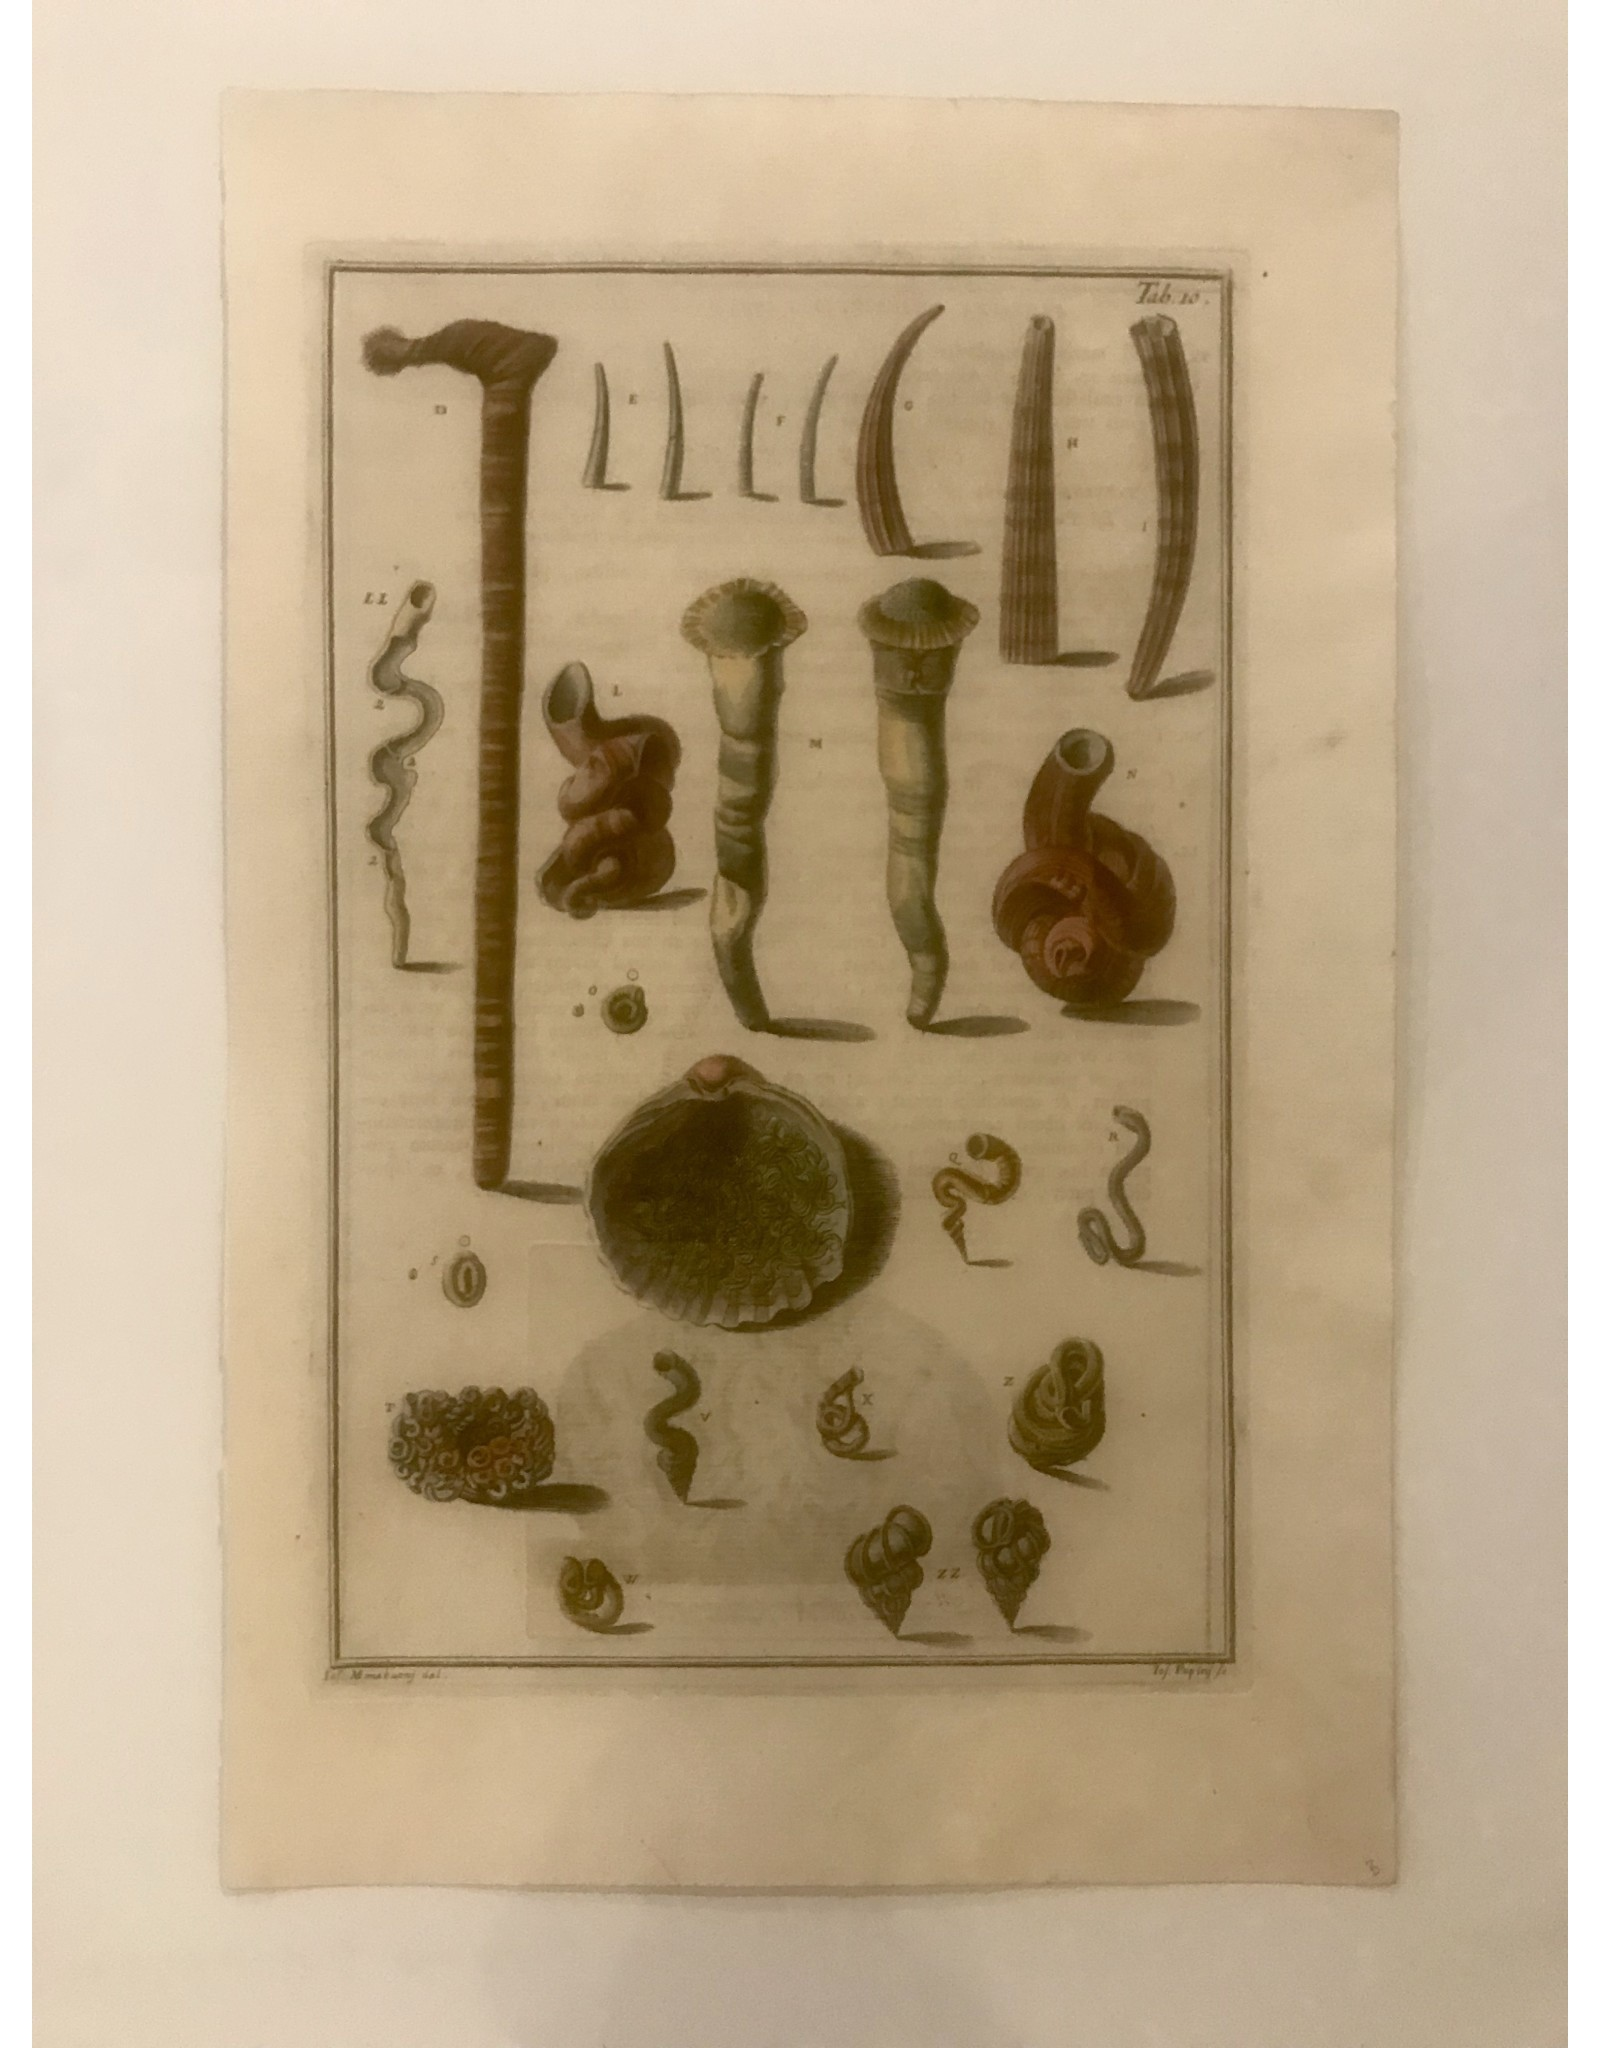 SPV Original educational Lithograph of Sea life in color 1800s